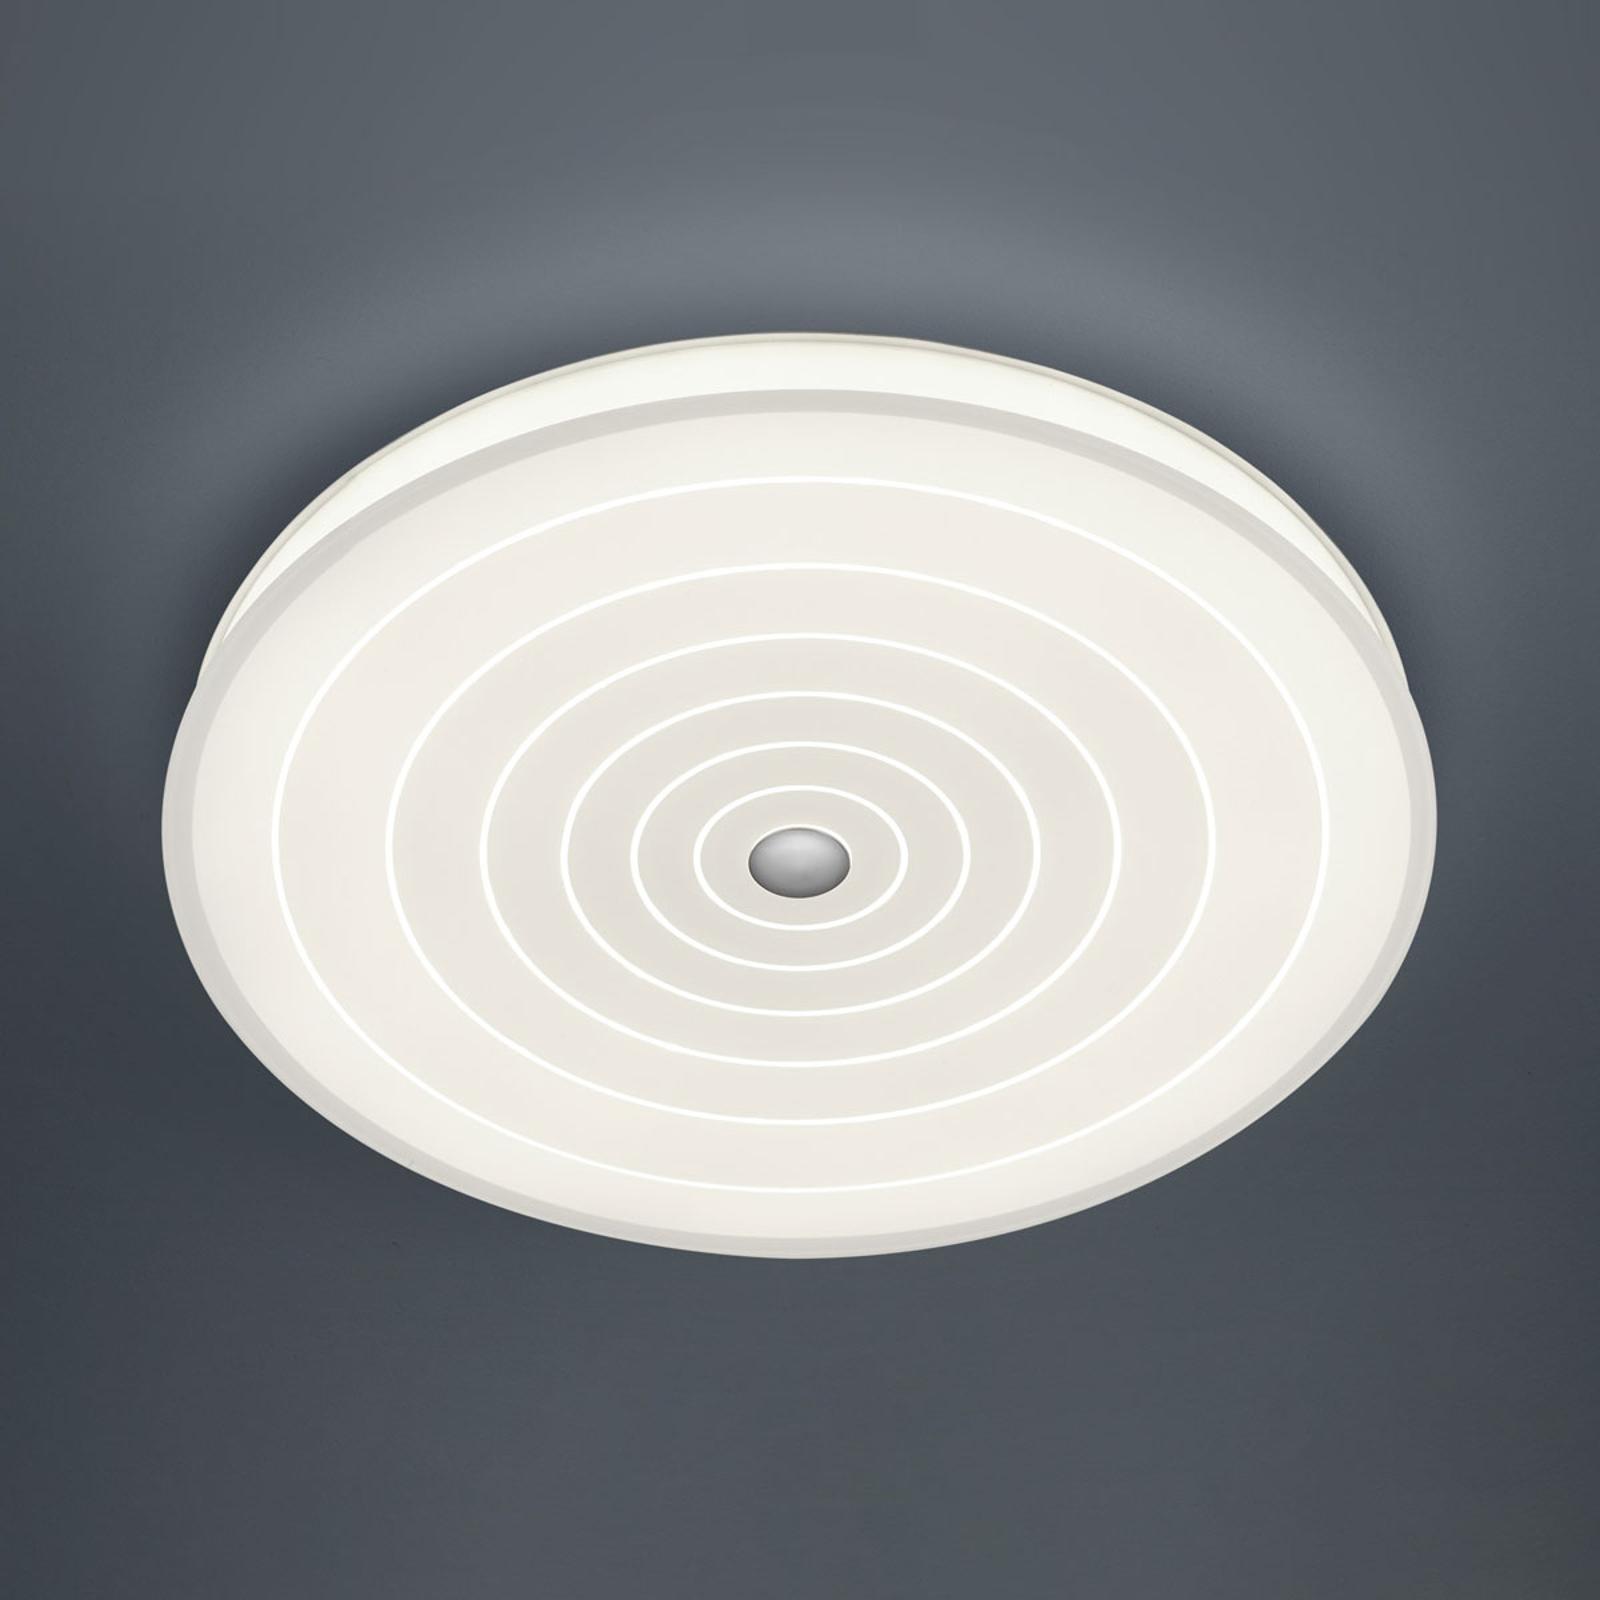 BANKAMP Mandala plafonnier LED cercle, Ø 42 cm